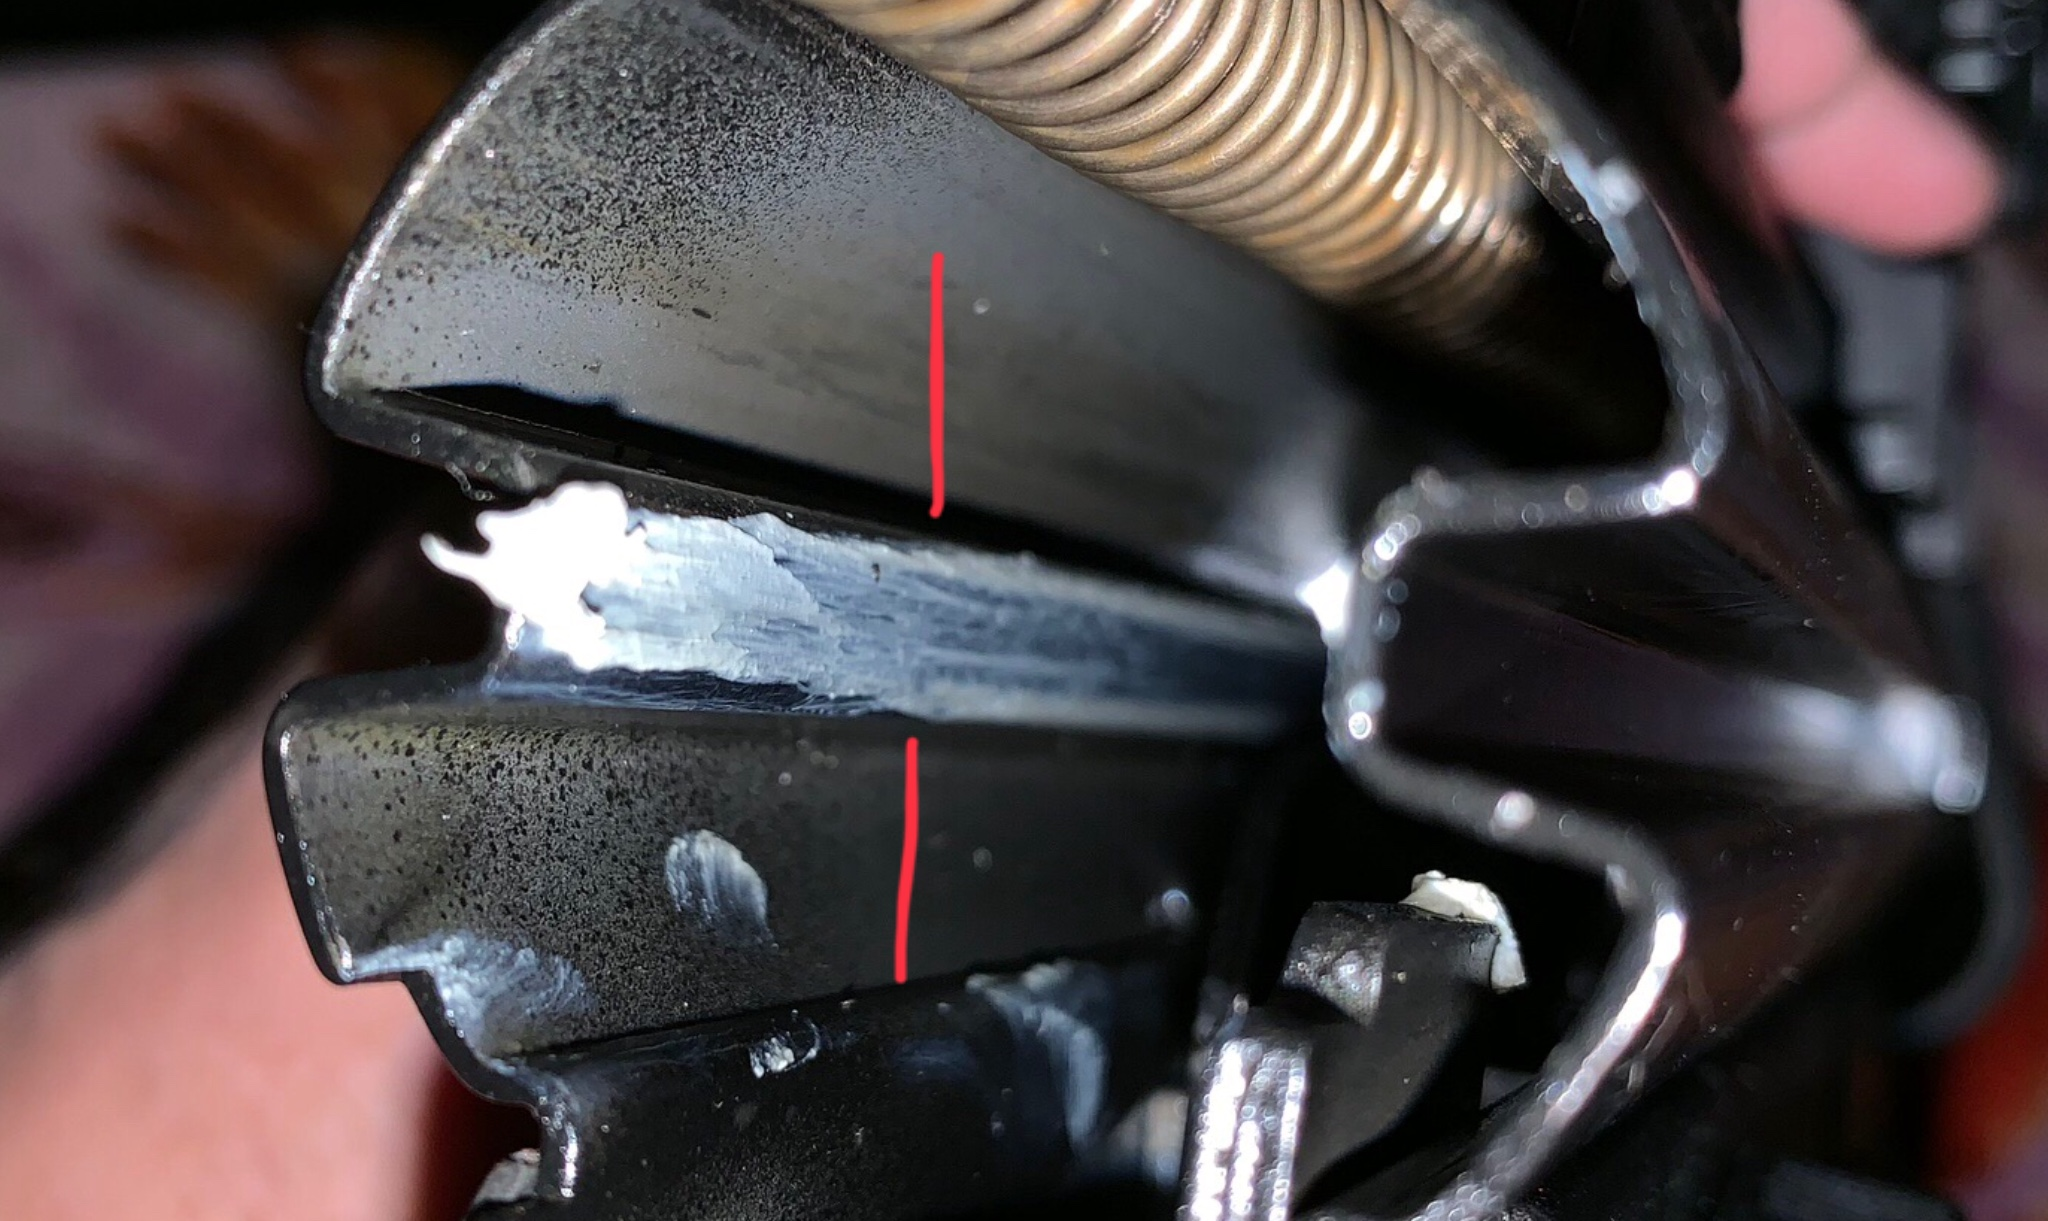 Sp5 suppressed bolt travel and knurled thread protectors-1b91cfc4-c134-462b-8b61-faac6d108868.jpeg